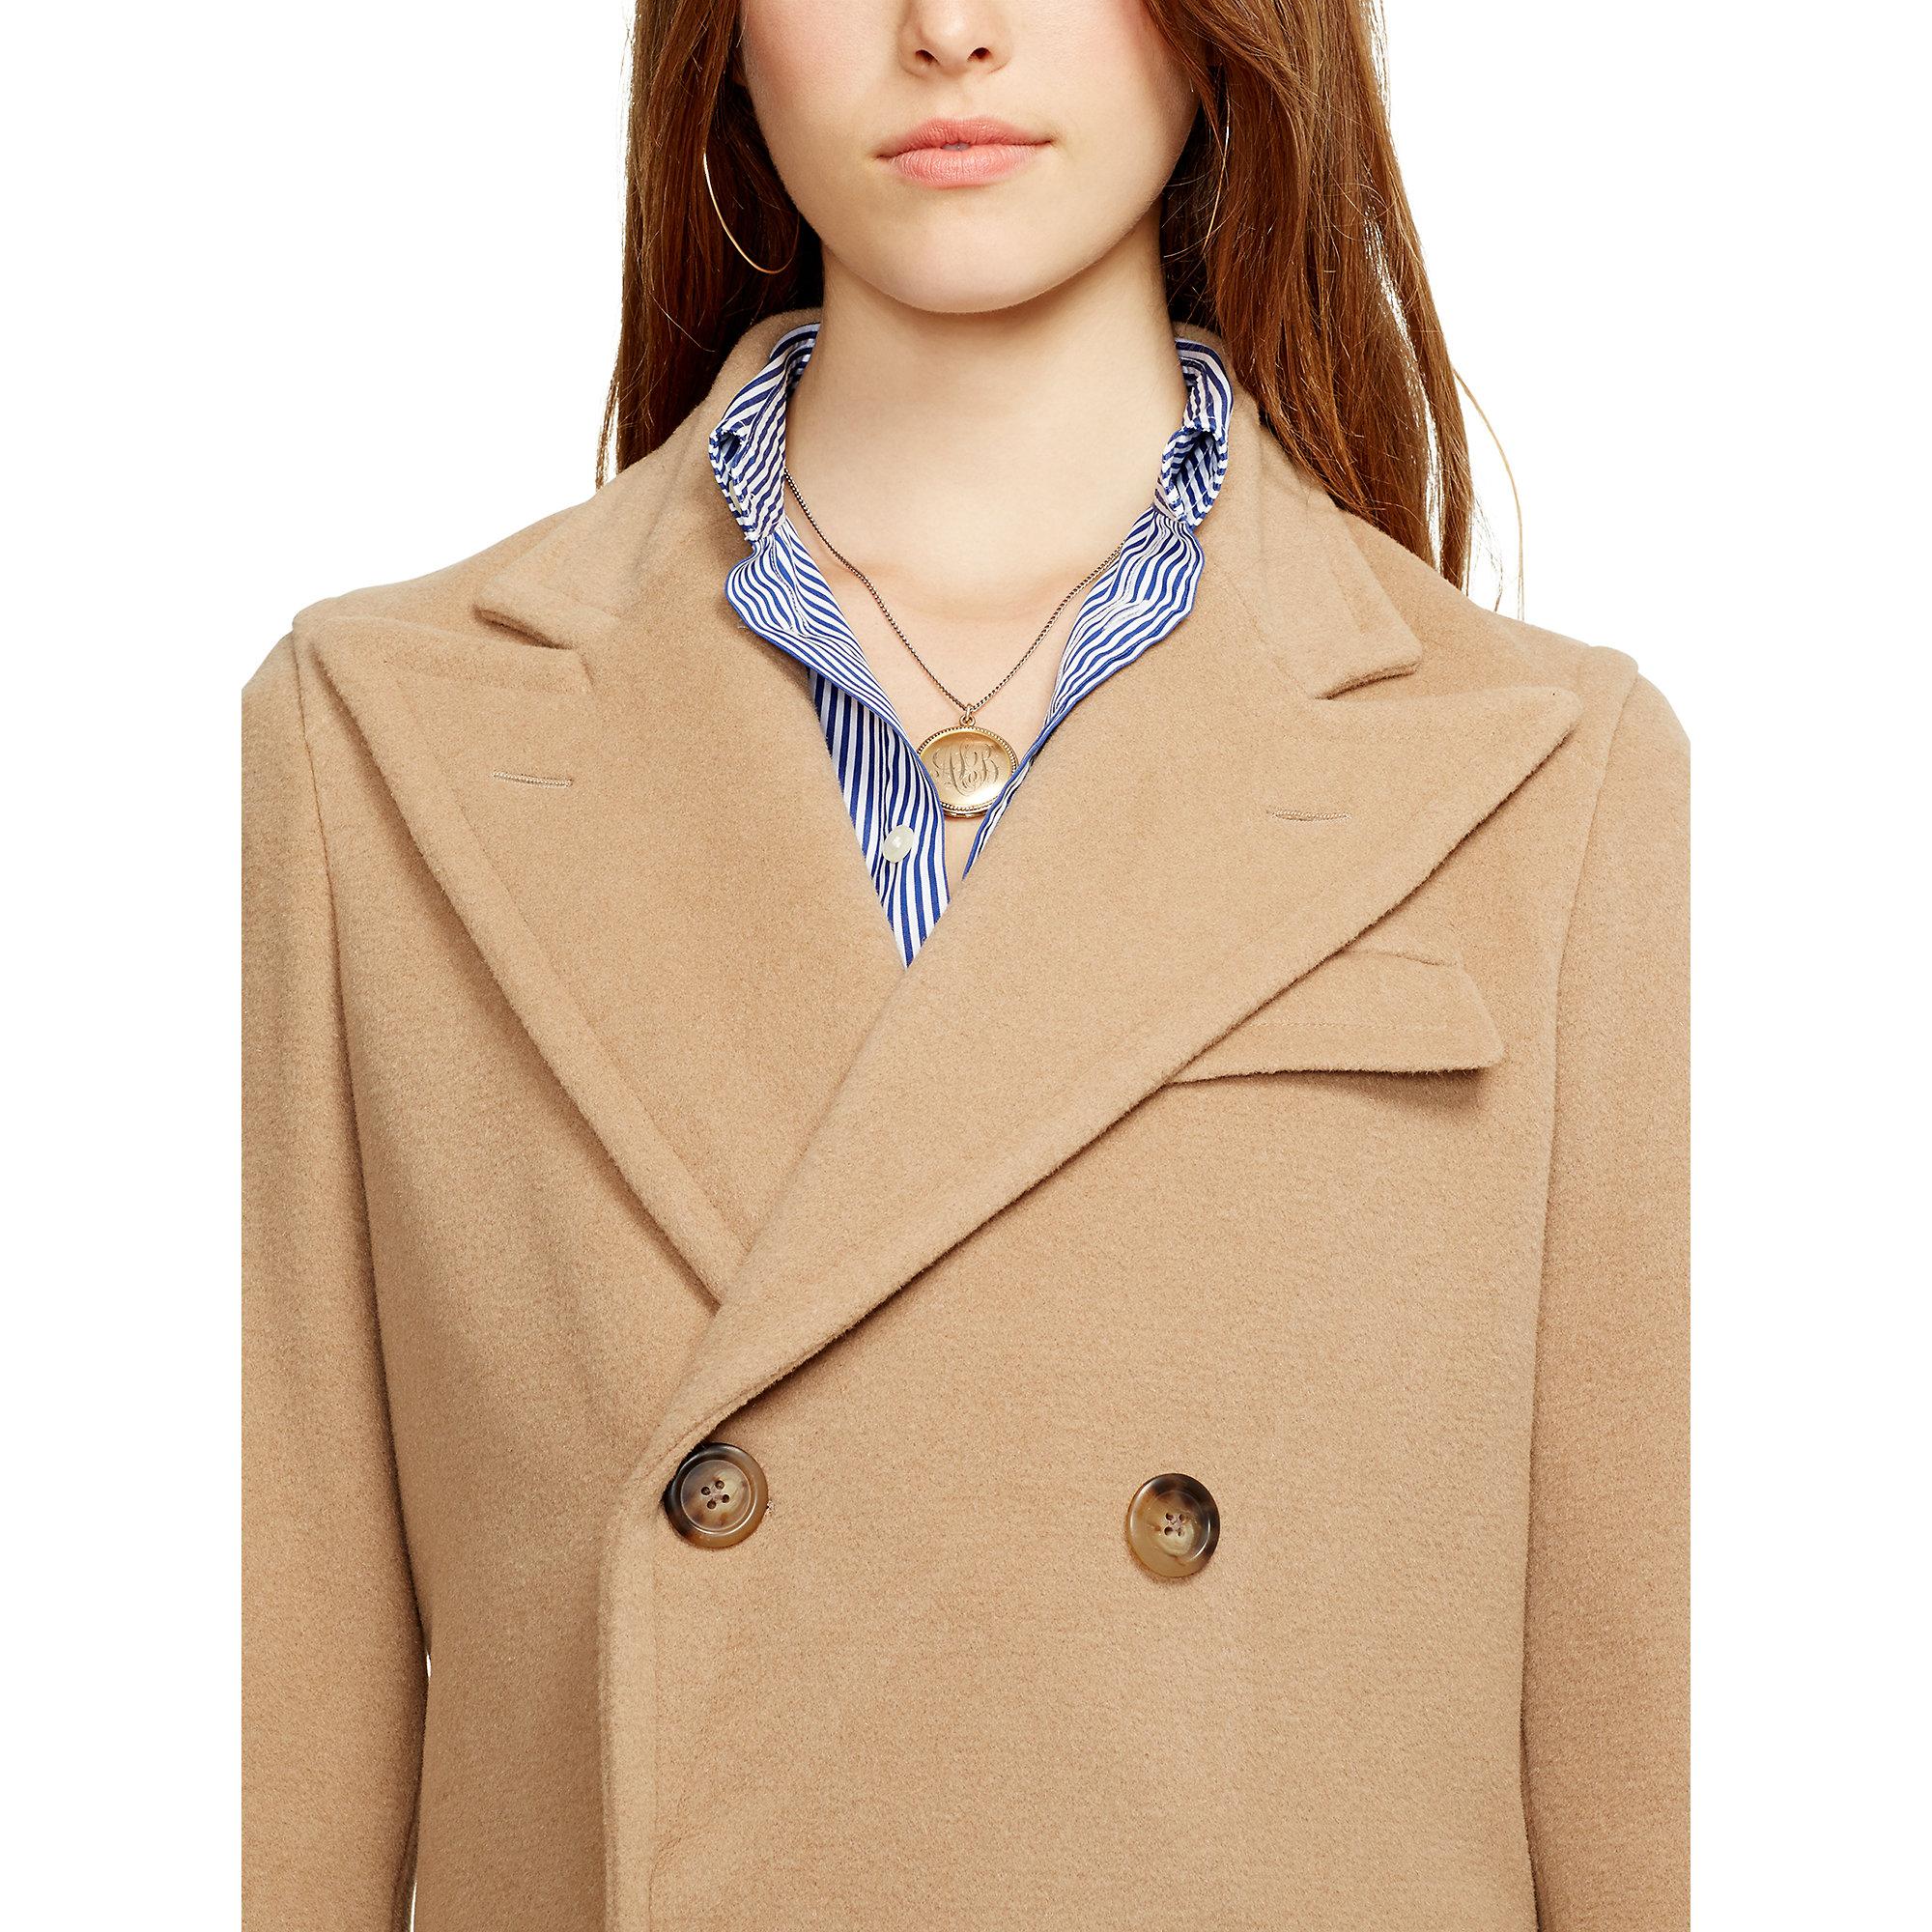 539953c10e29a Lyst - Polo Ralph Lauren Camel Hair Coat in Natural